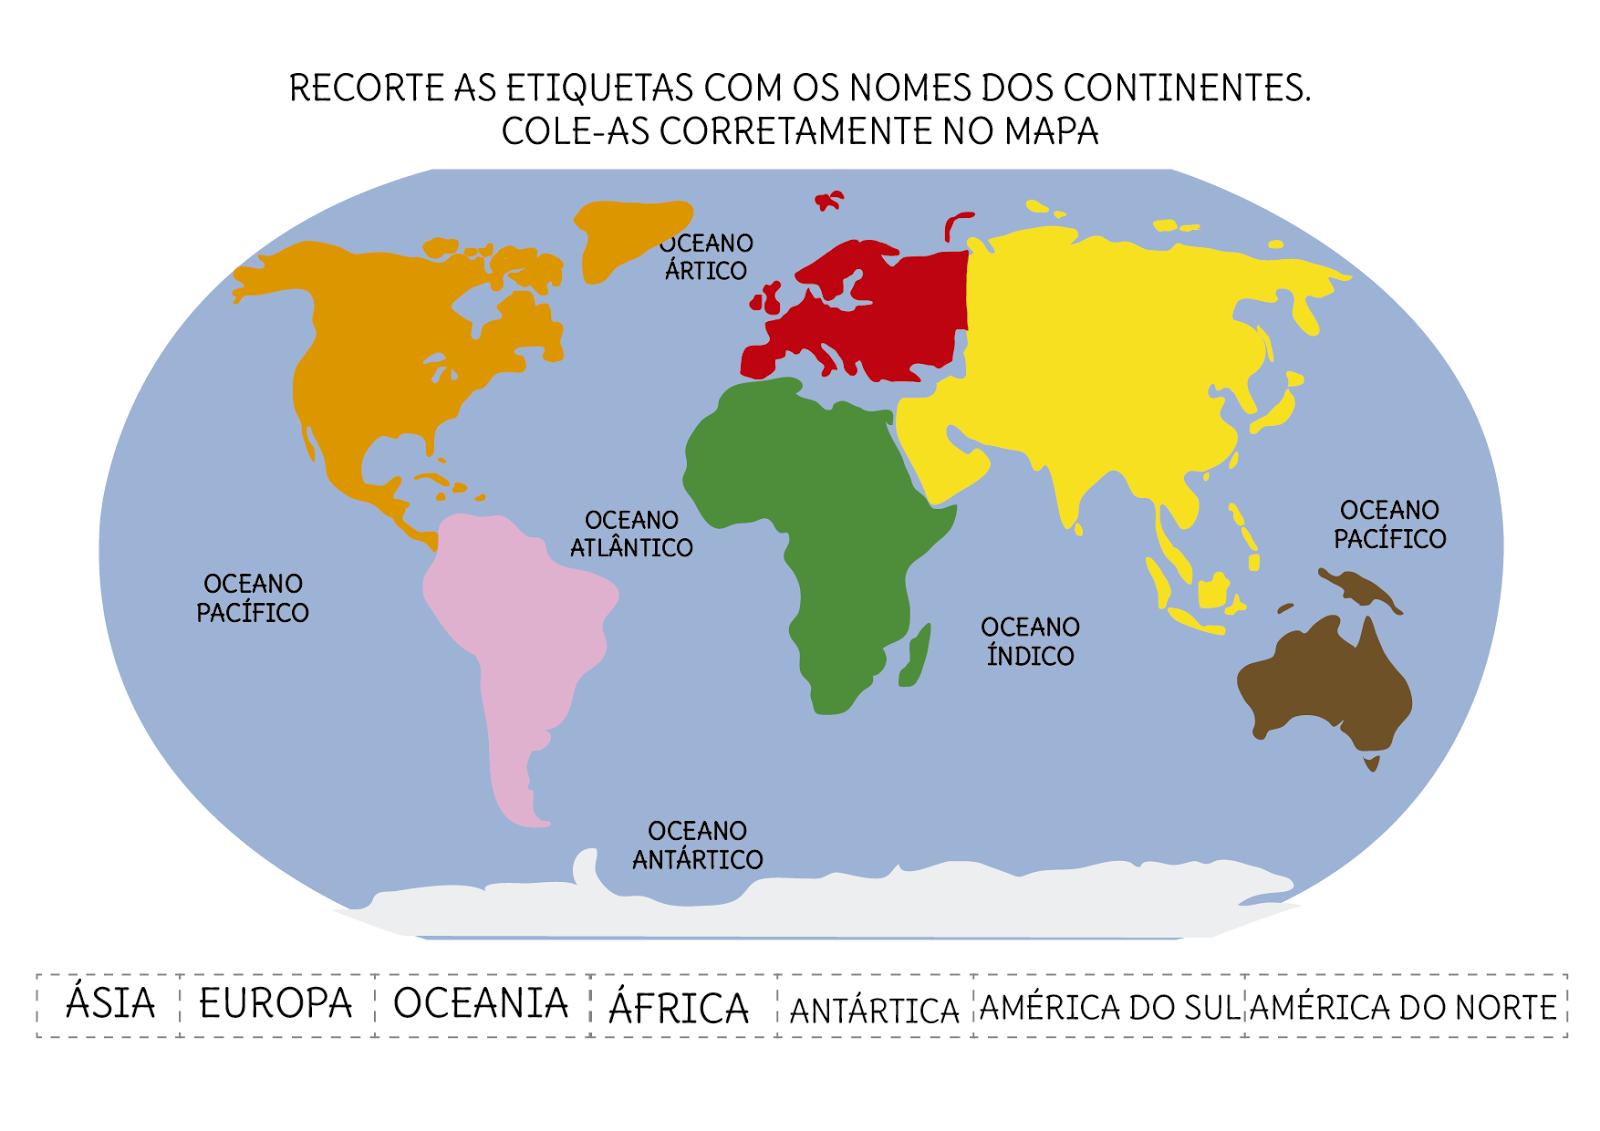 Cuales Son Los 6 Continentes Del Planisferio: Notebook Da Profª: Introdução à Geografia (Parte III